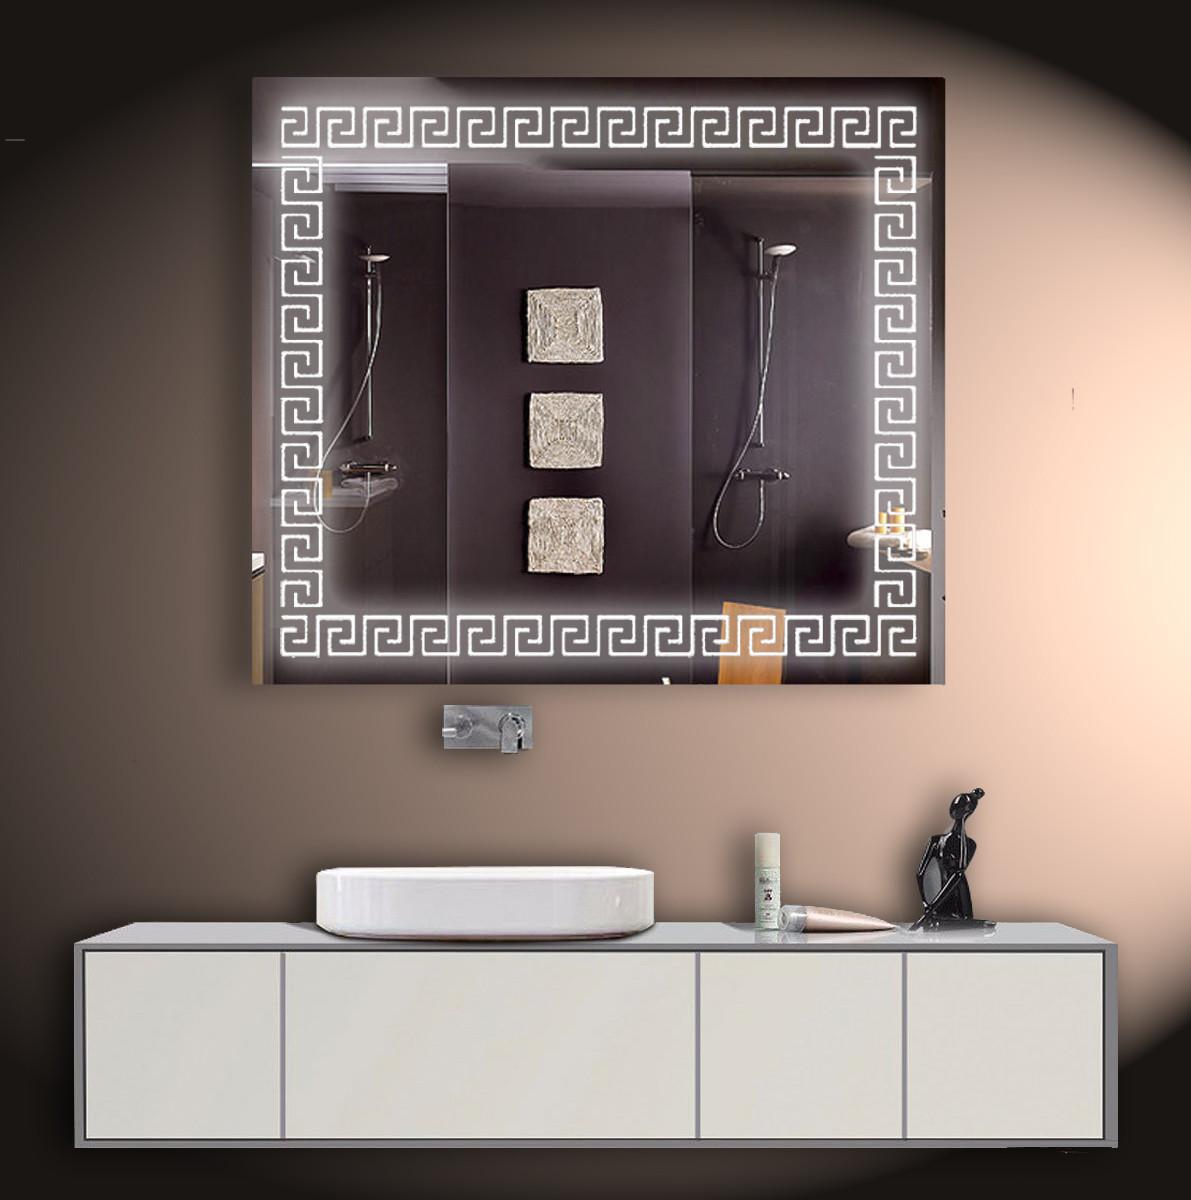 Зеркало LED со светодиодной подсветкой ver-3072 800х700 мм